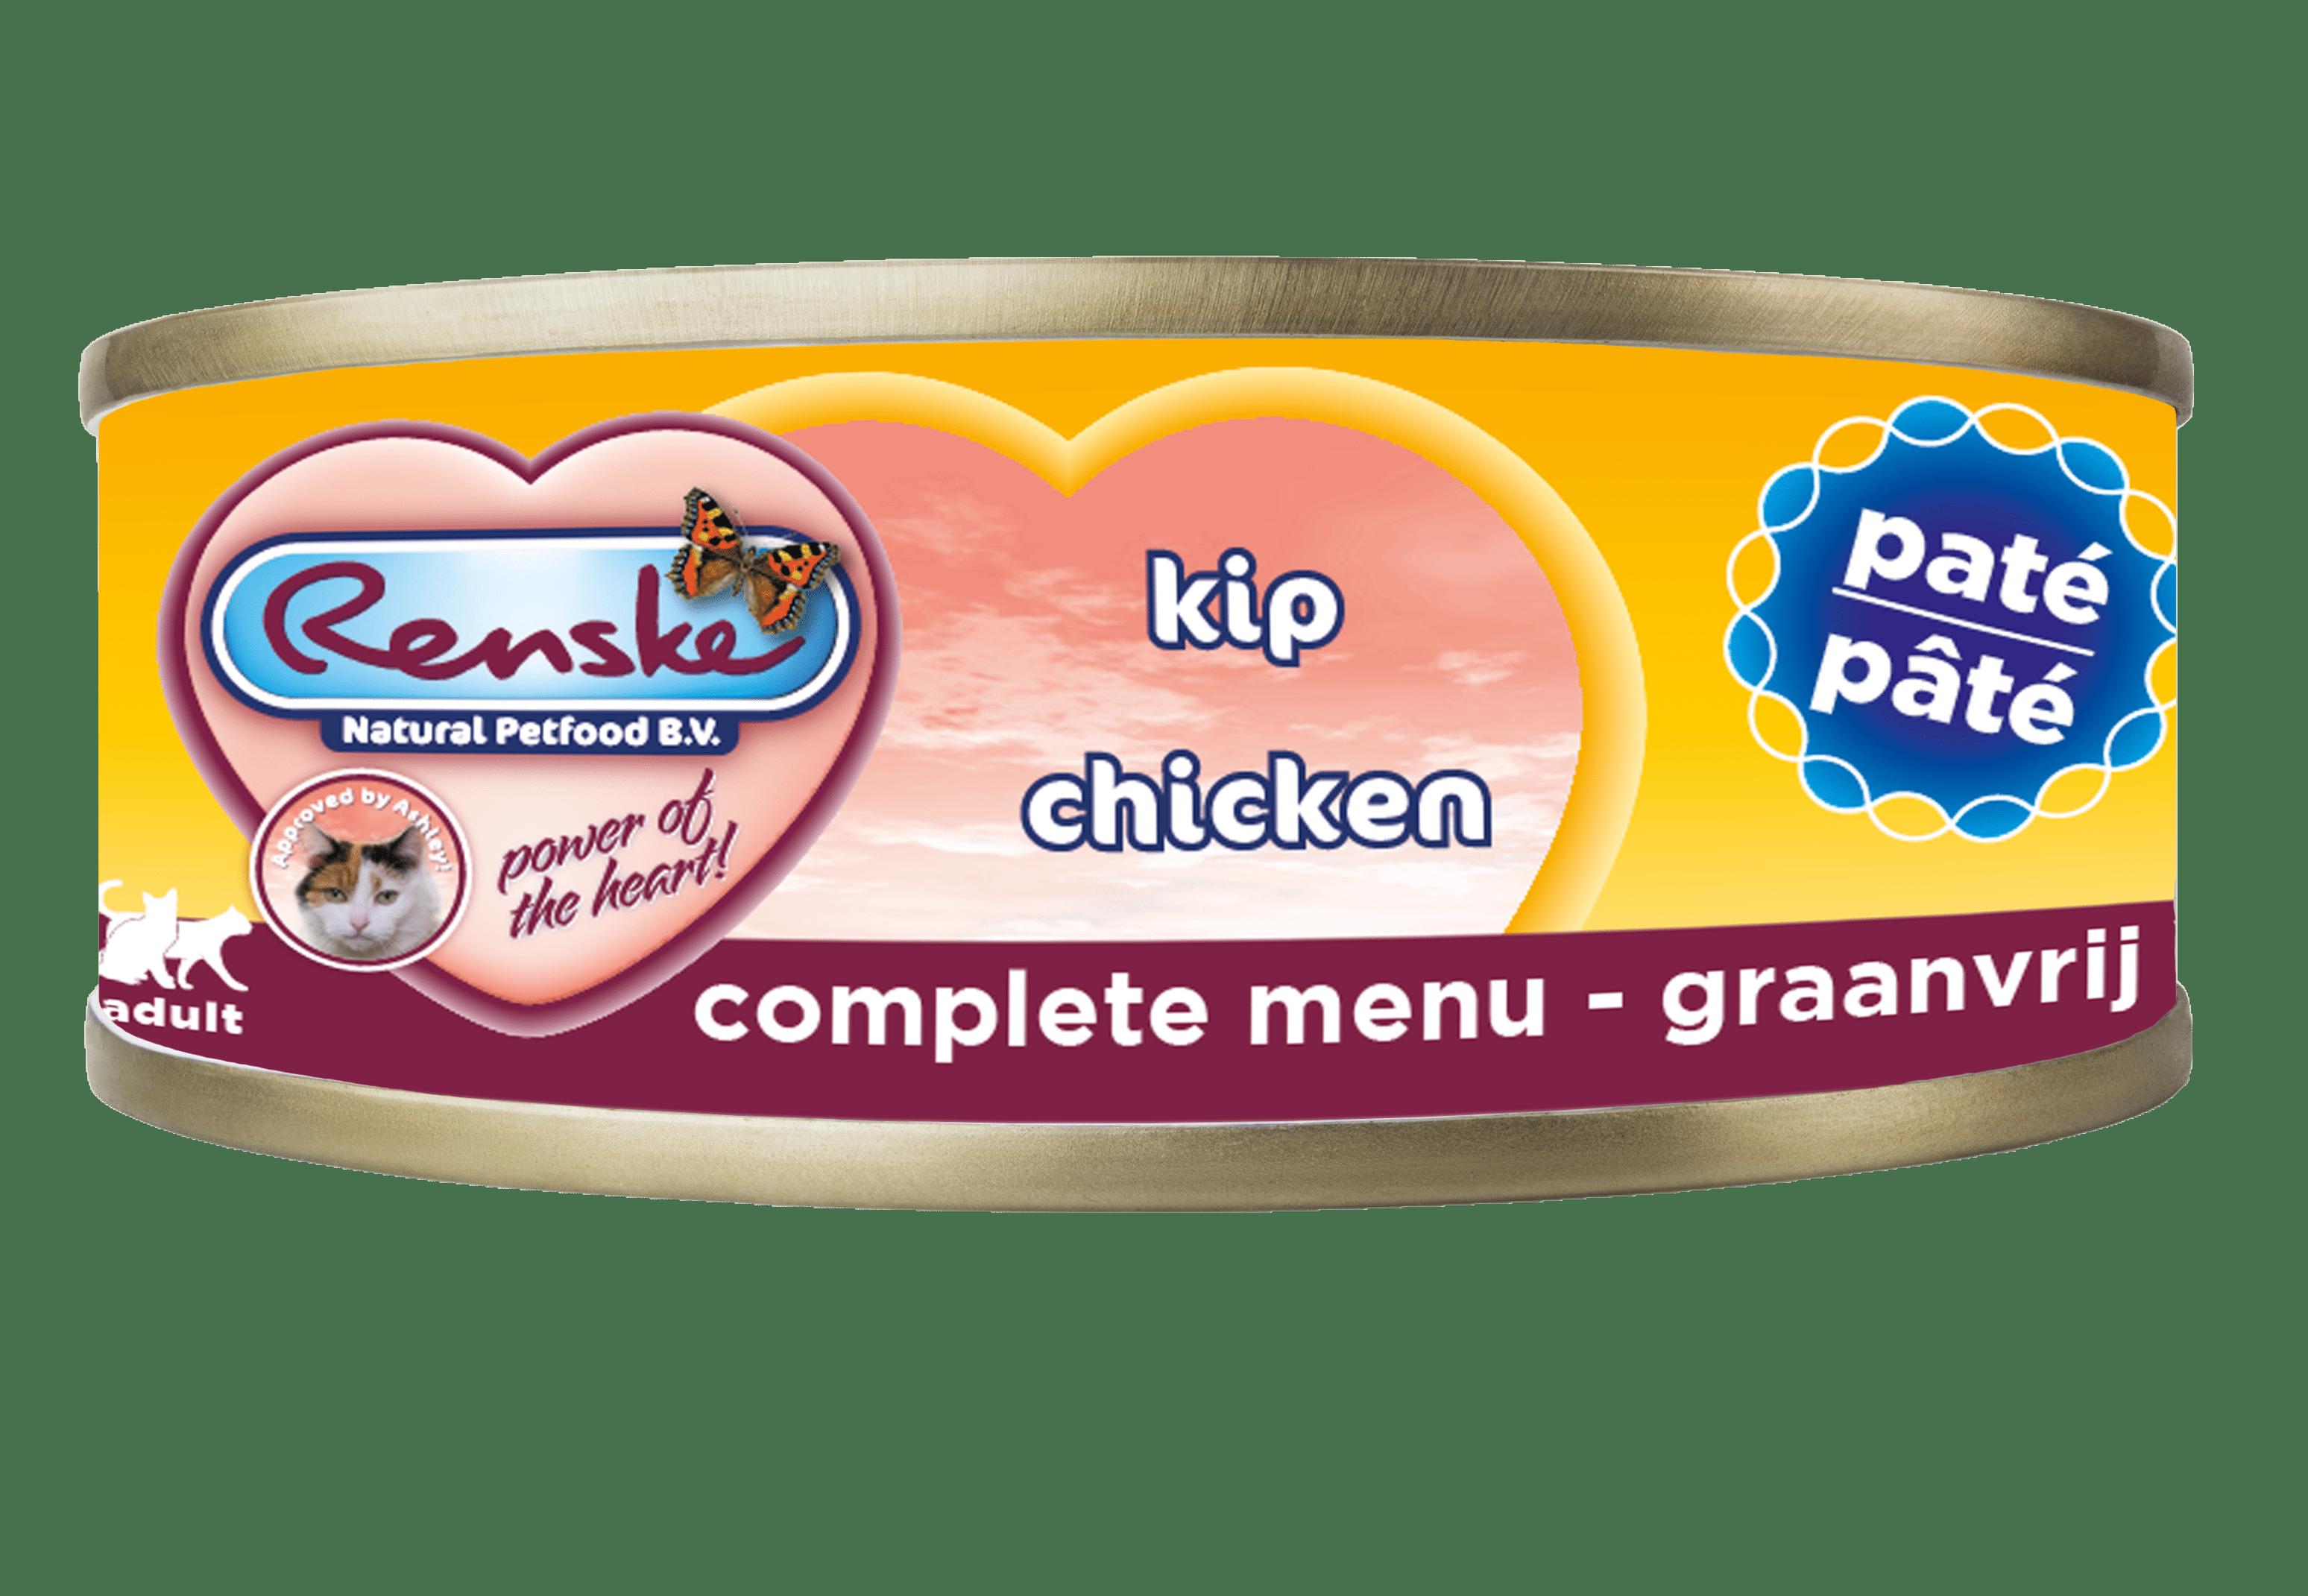 renske-70g-kat-kip-paté-productfoto_optimized